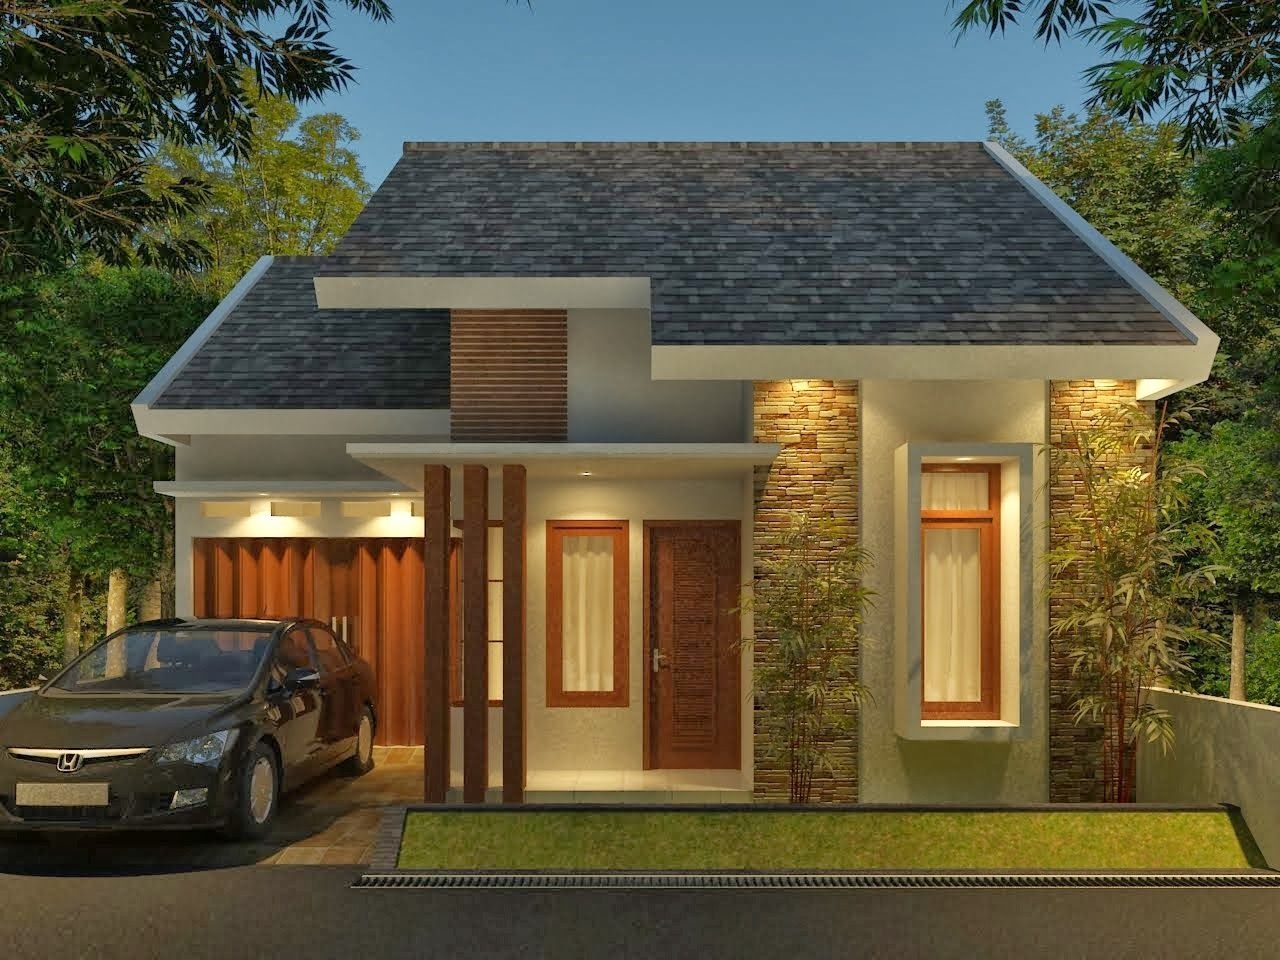 720+ Gambar Rumah Minimalis Hd HD Terbaik